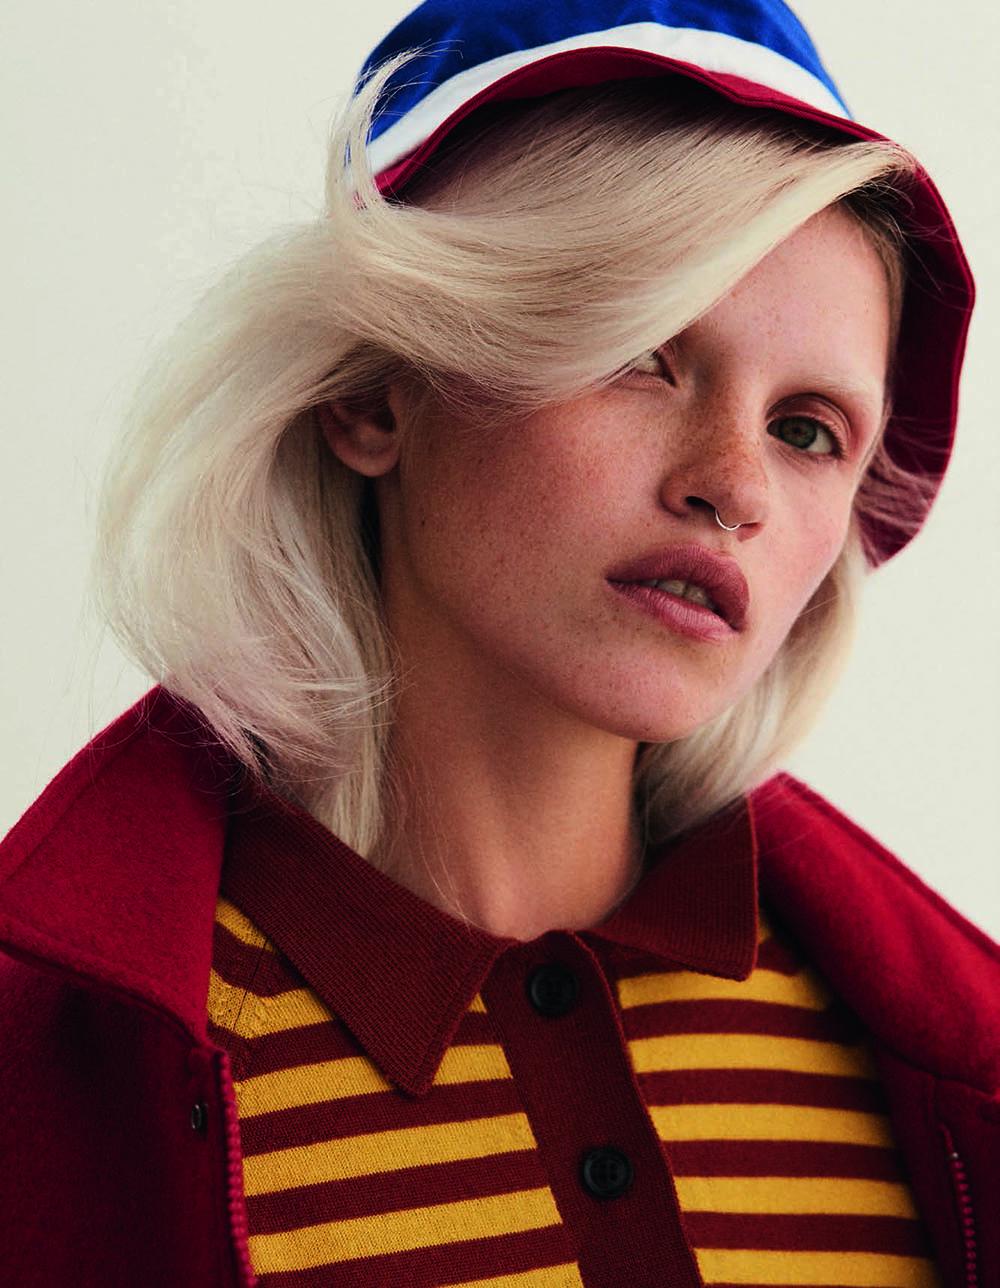 Anja Konstantinova by Agnieszka Kulesza & Łukasz Pik for Vogue Poland November 2019